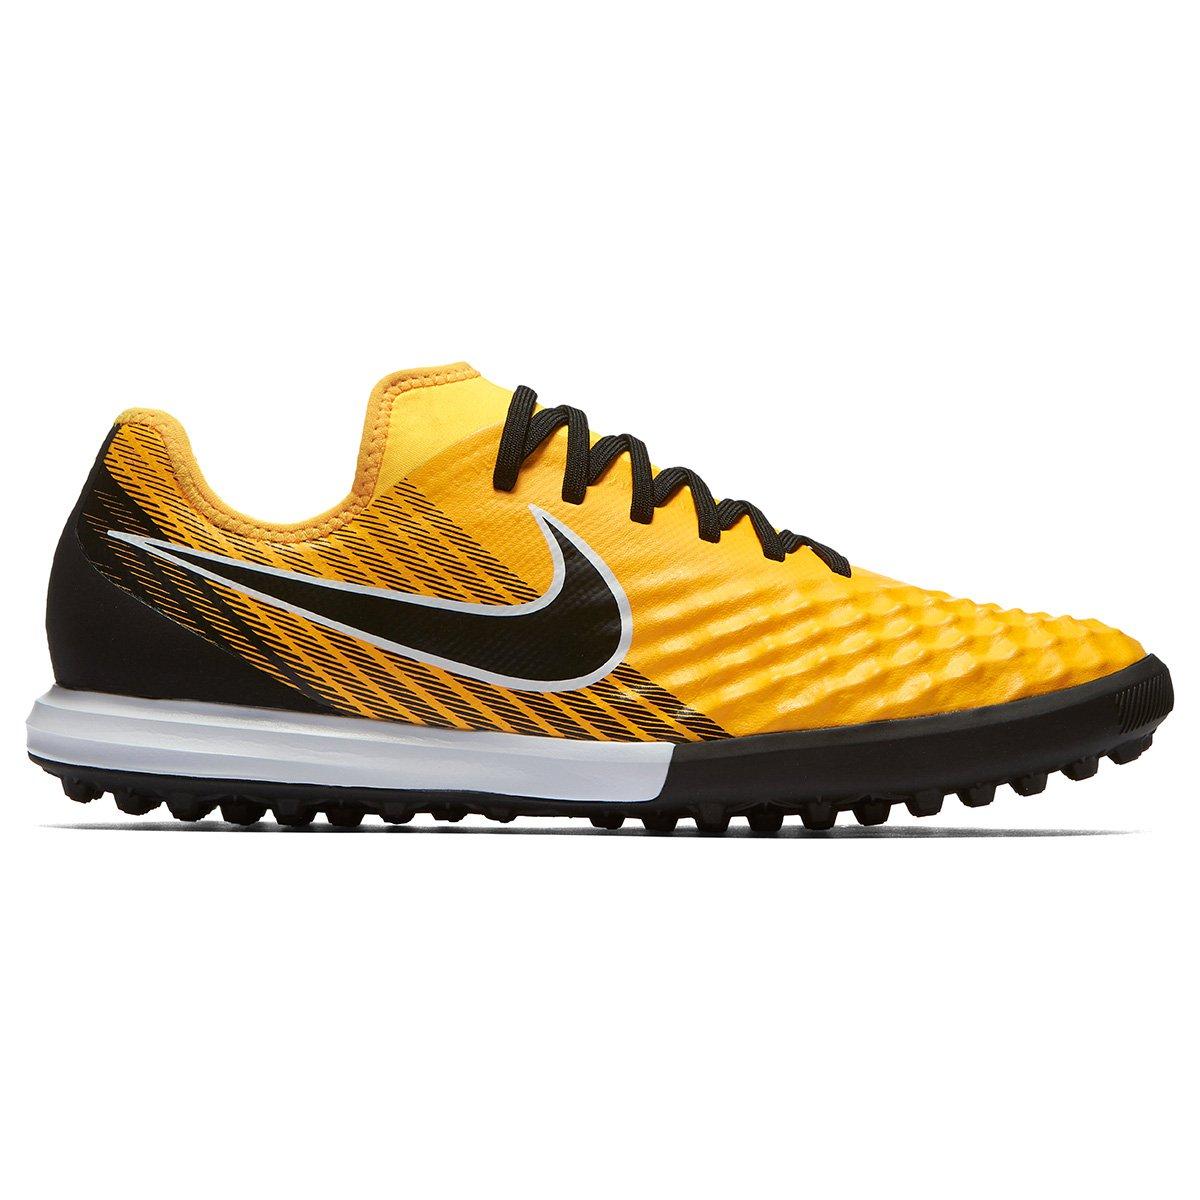 46f604220c Chuteira Society Nike Magista Finale 2 TF - Preto e Laranja